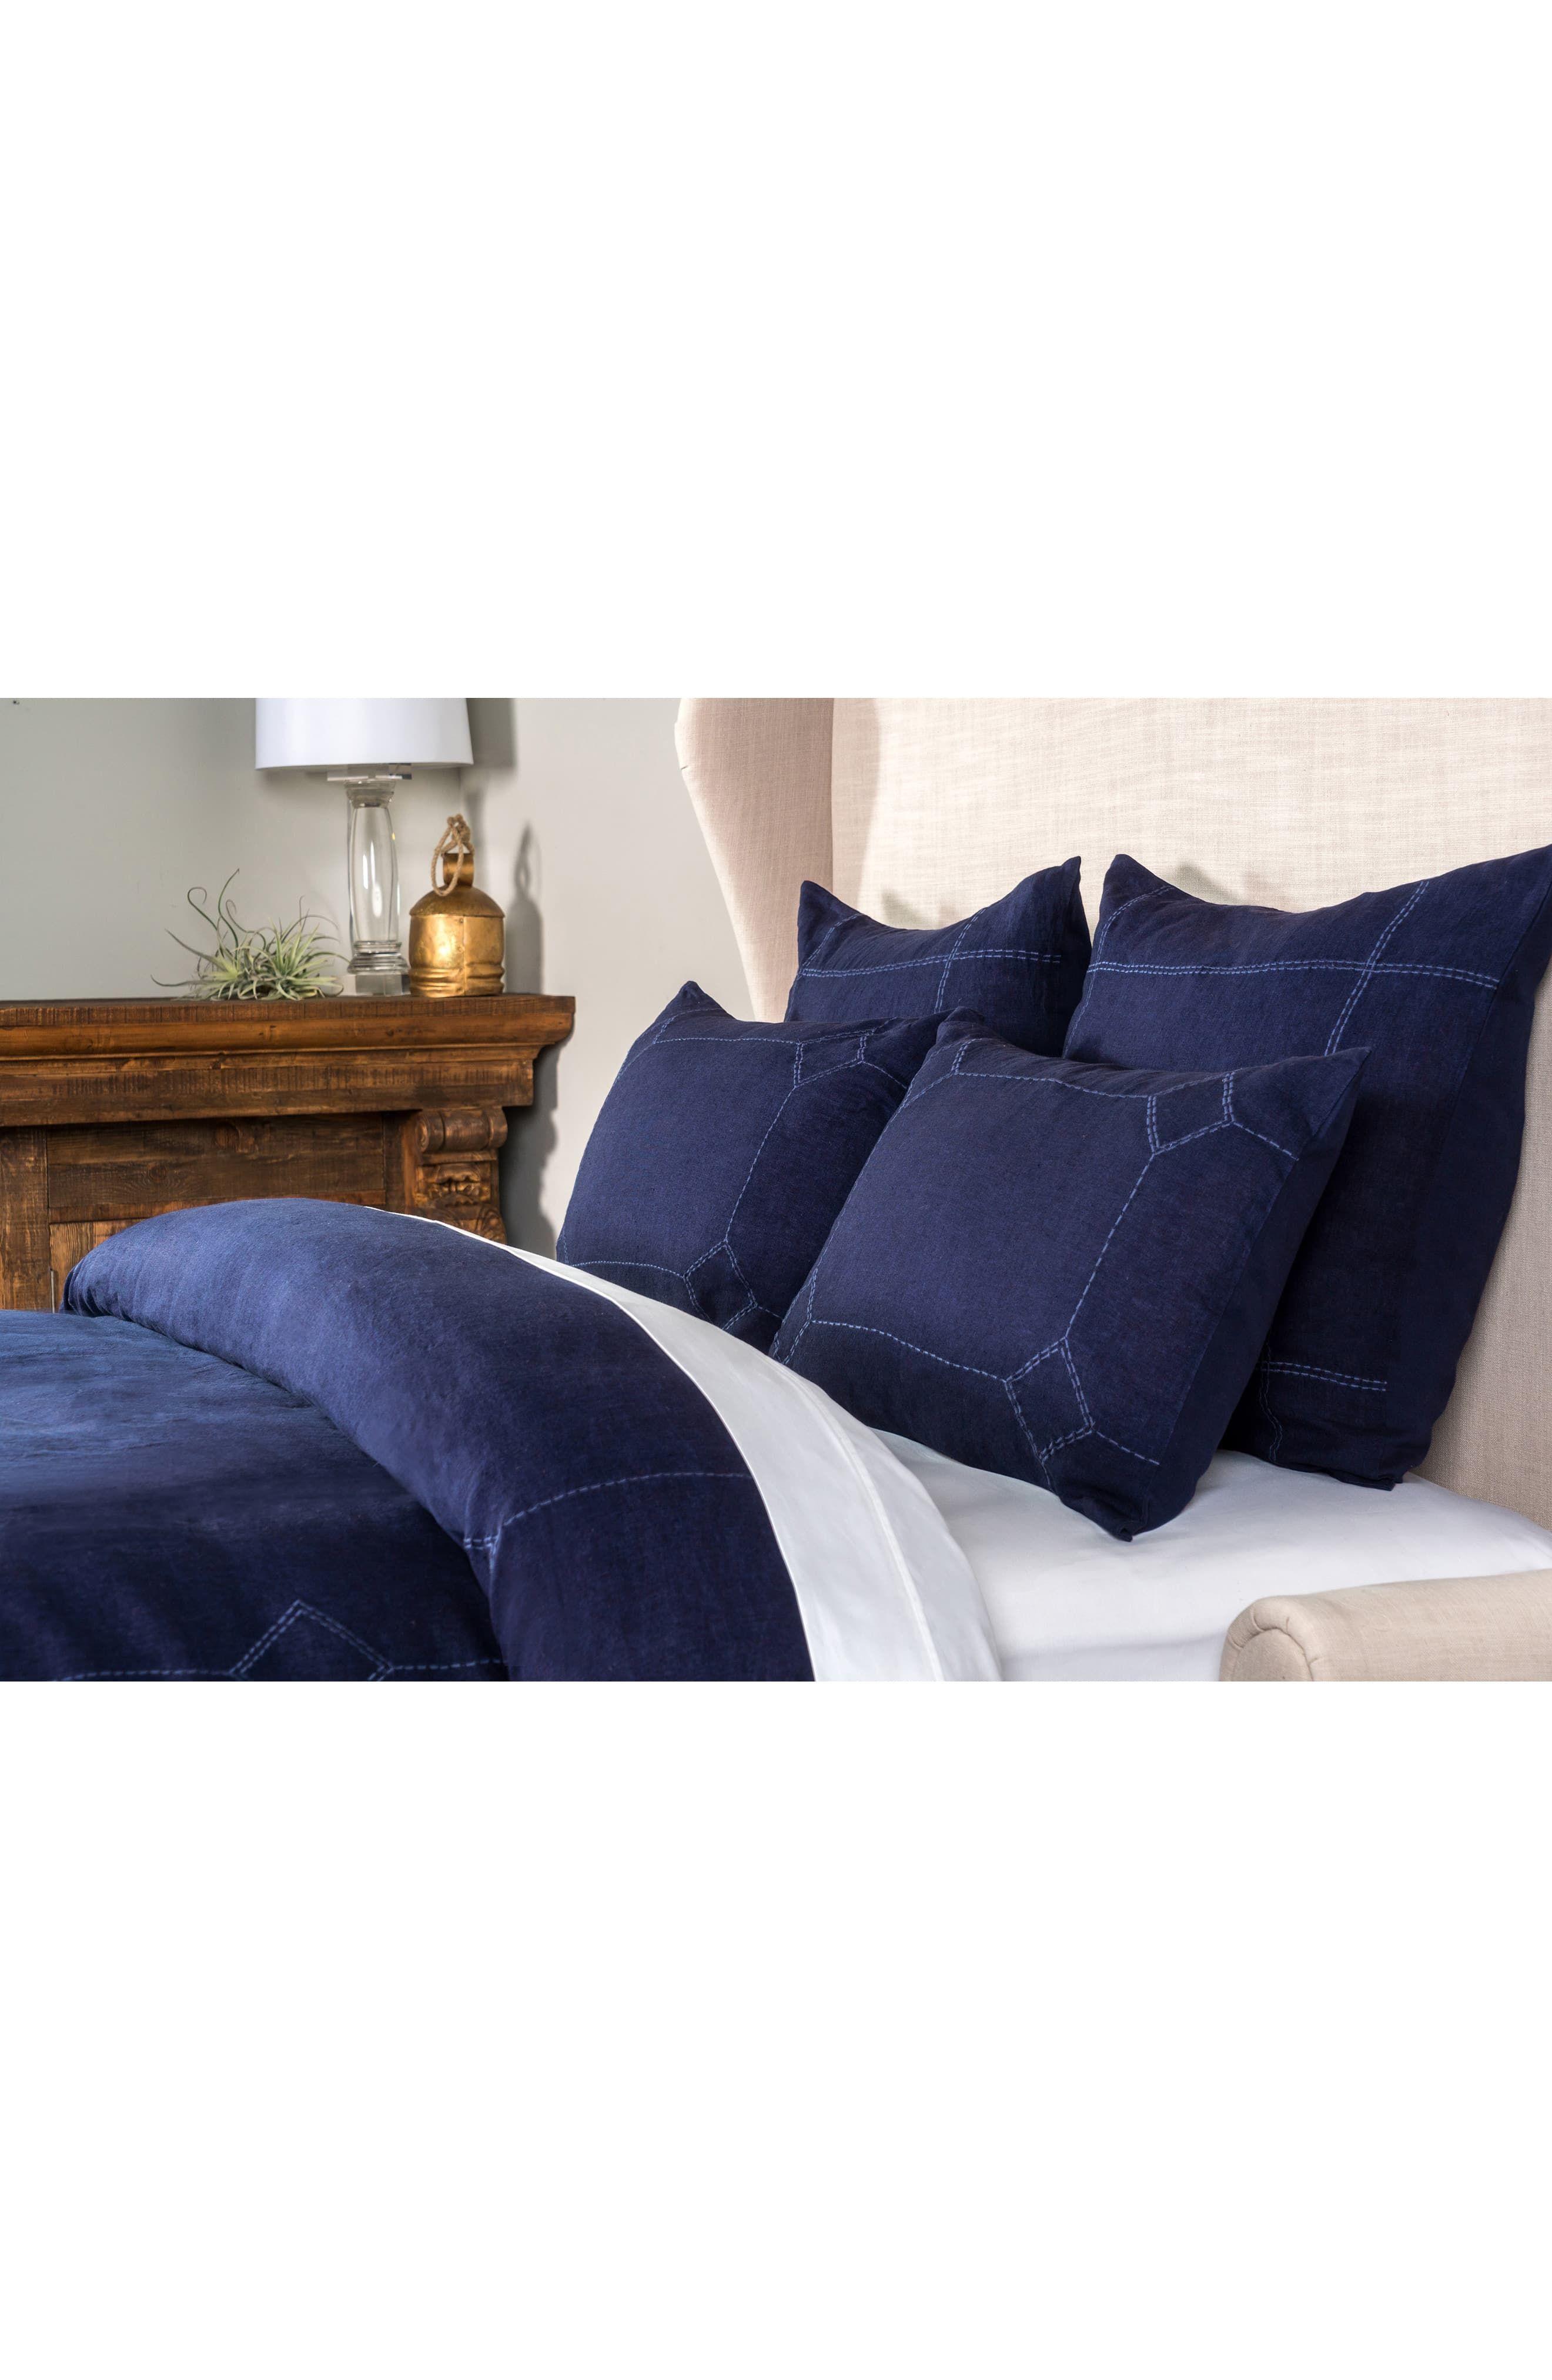 Villa Home Collection Heirloom Linen Duvet Cover Bed